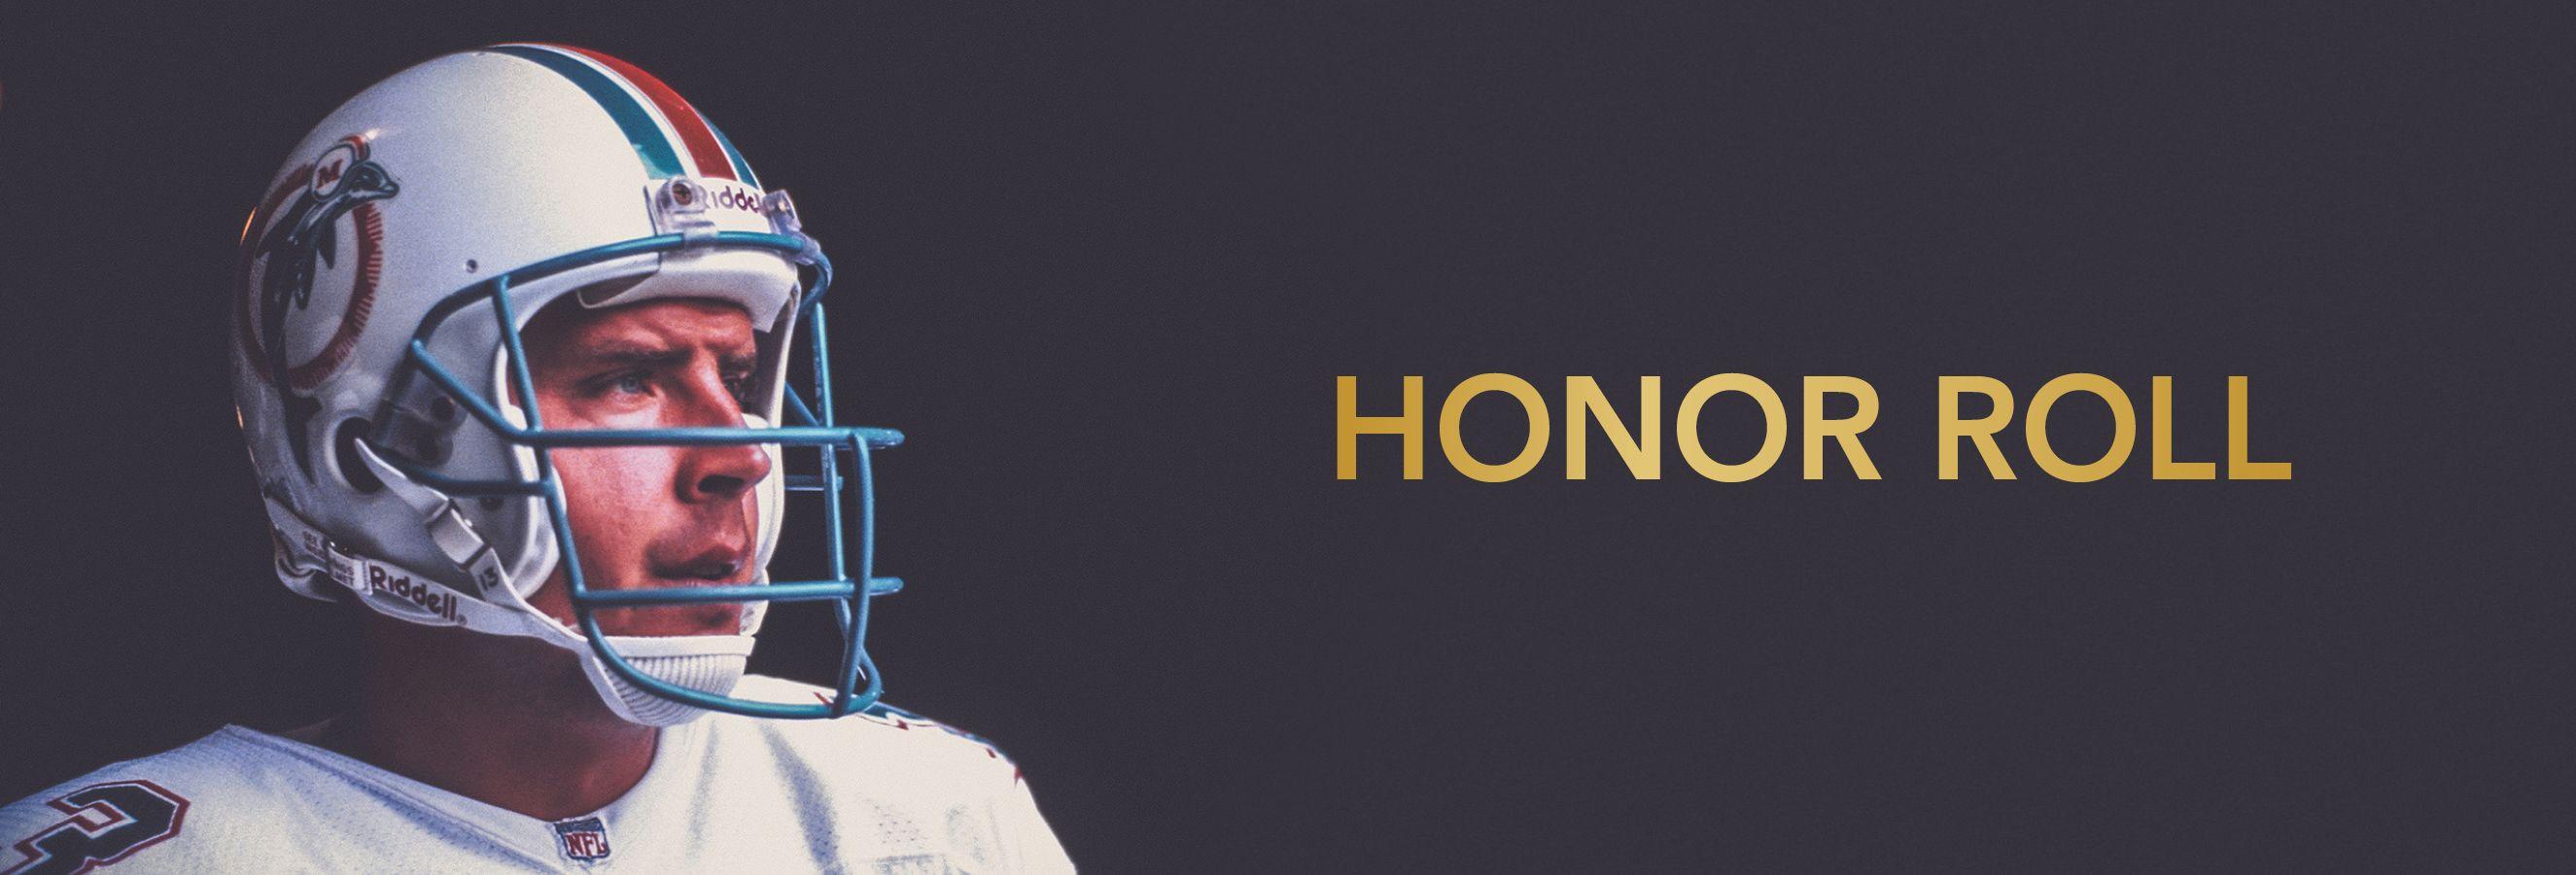 WEB015_AlumniHonorPage